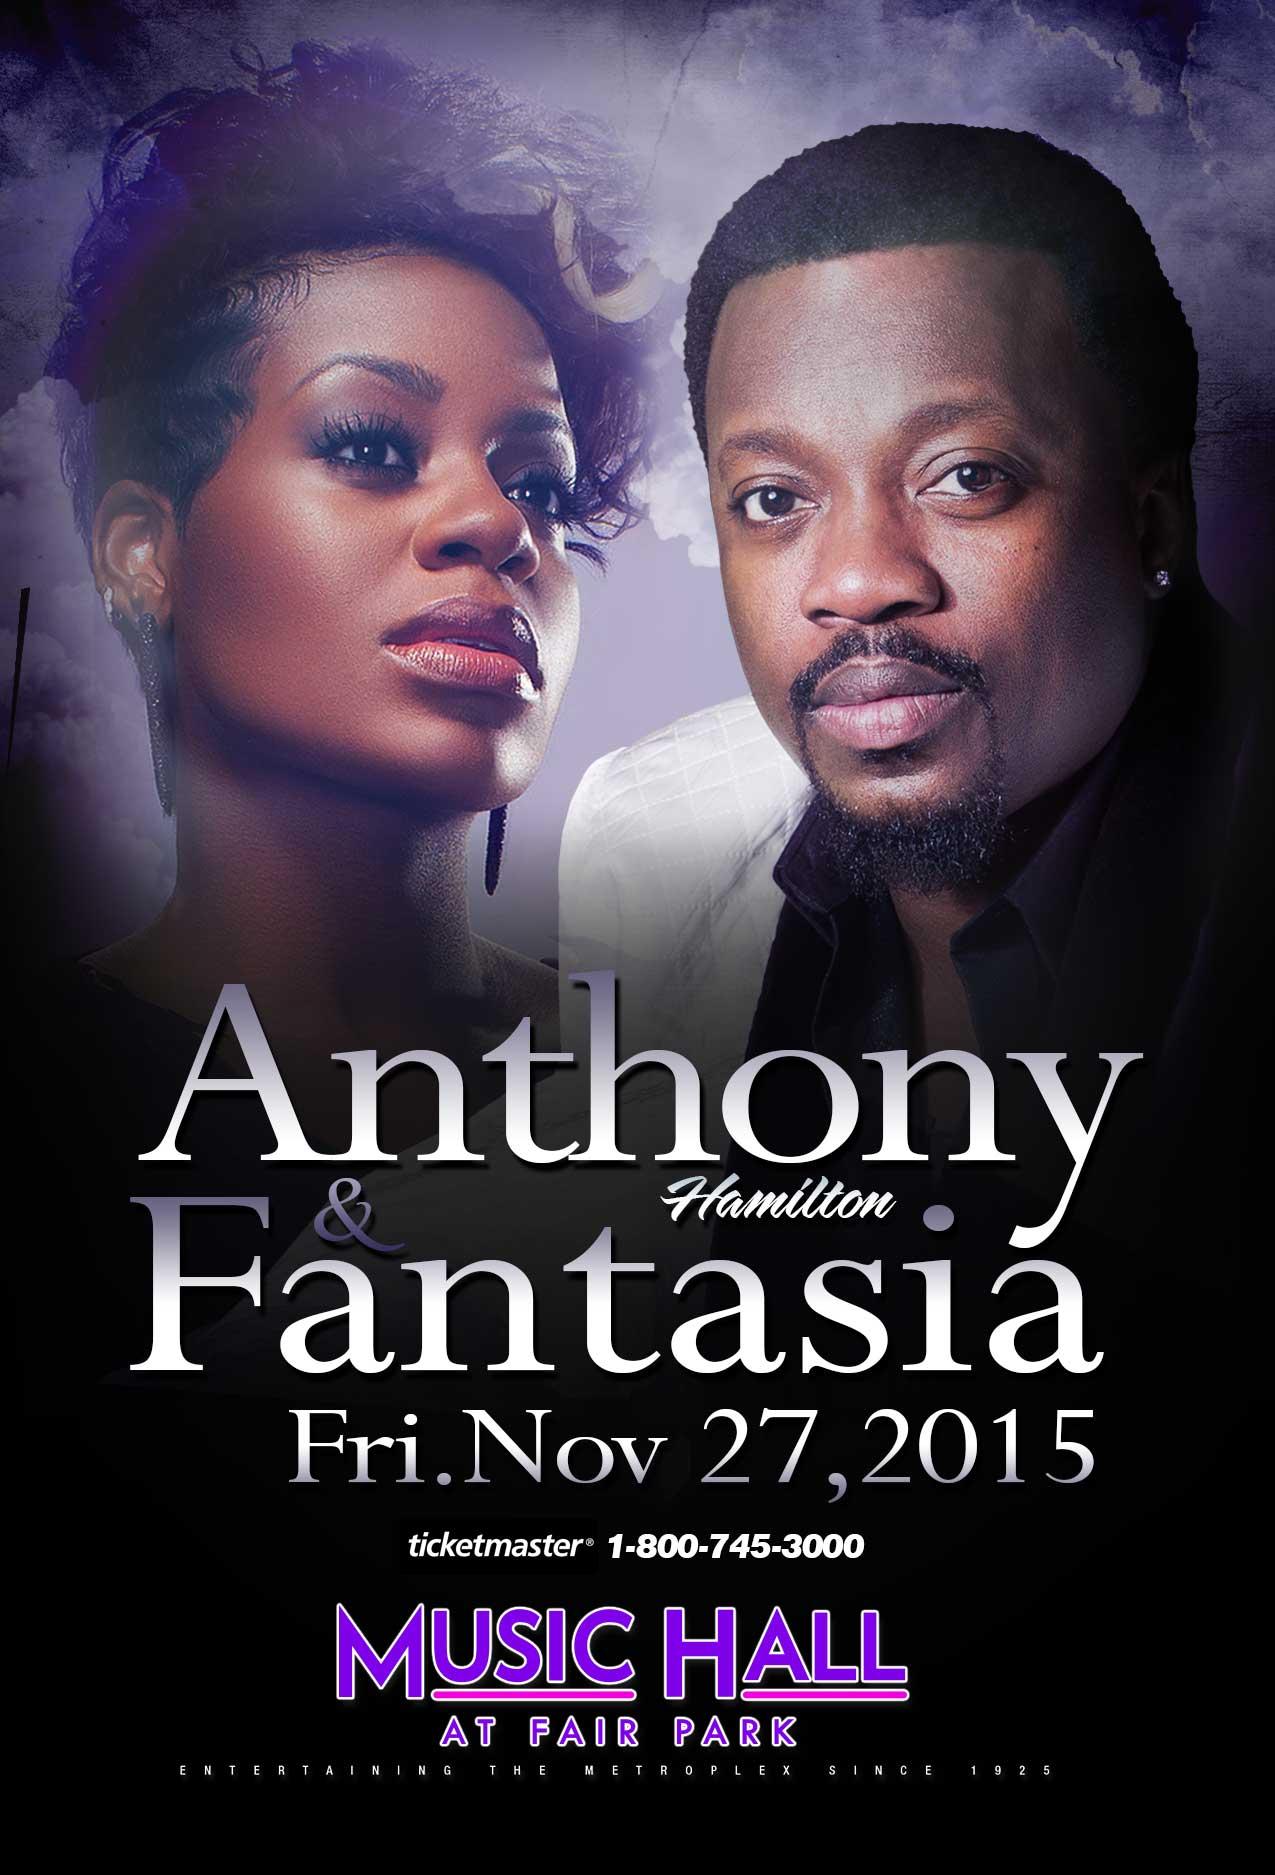 112715-musichall-fantasia+anthony